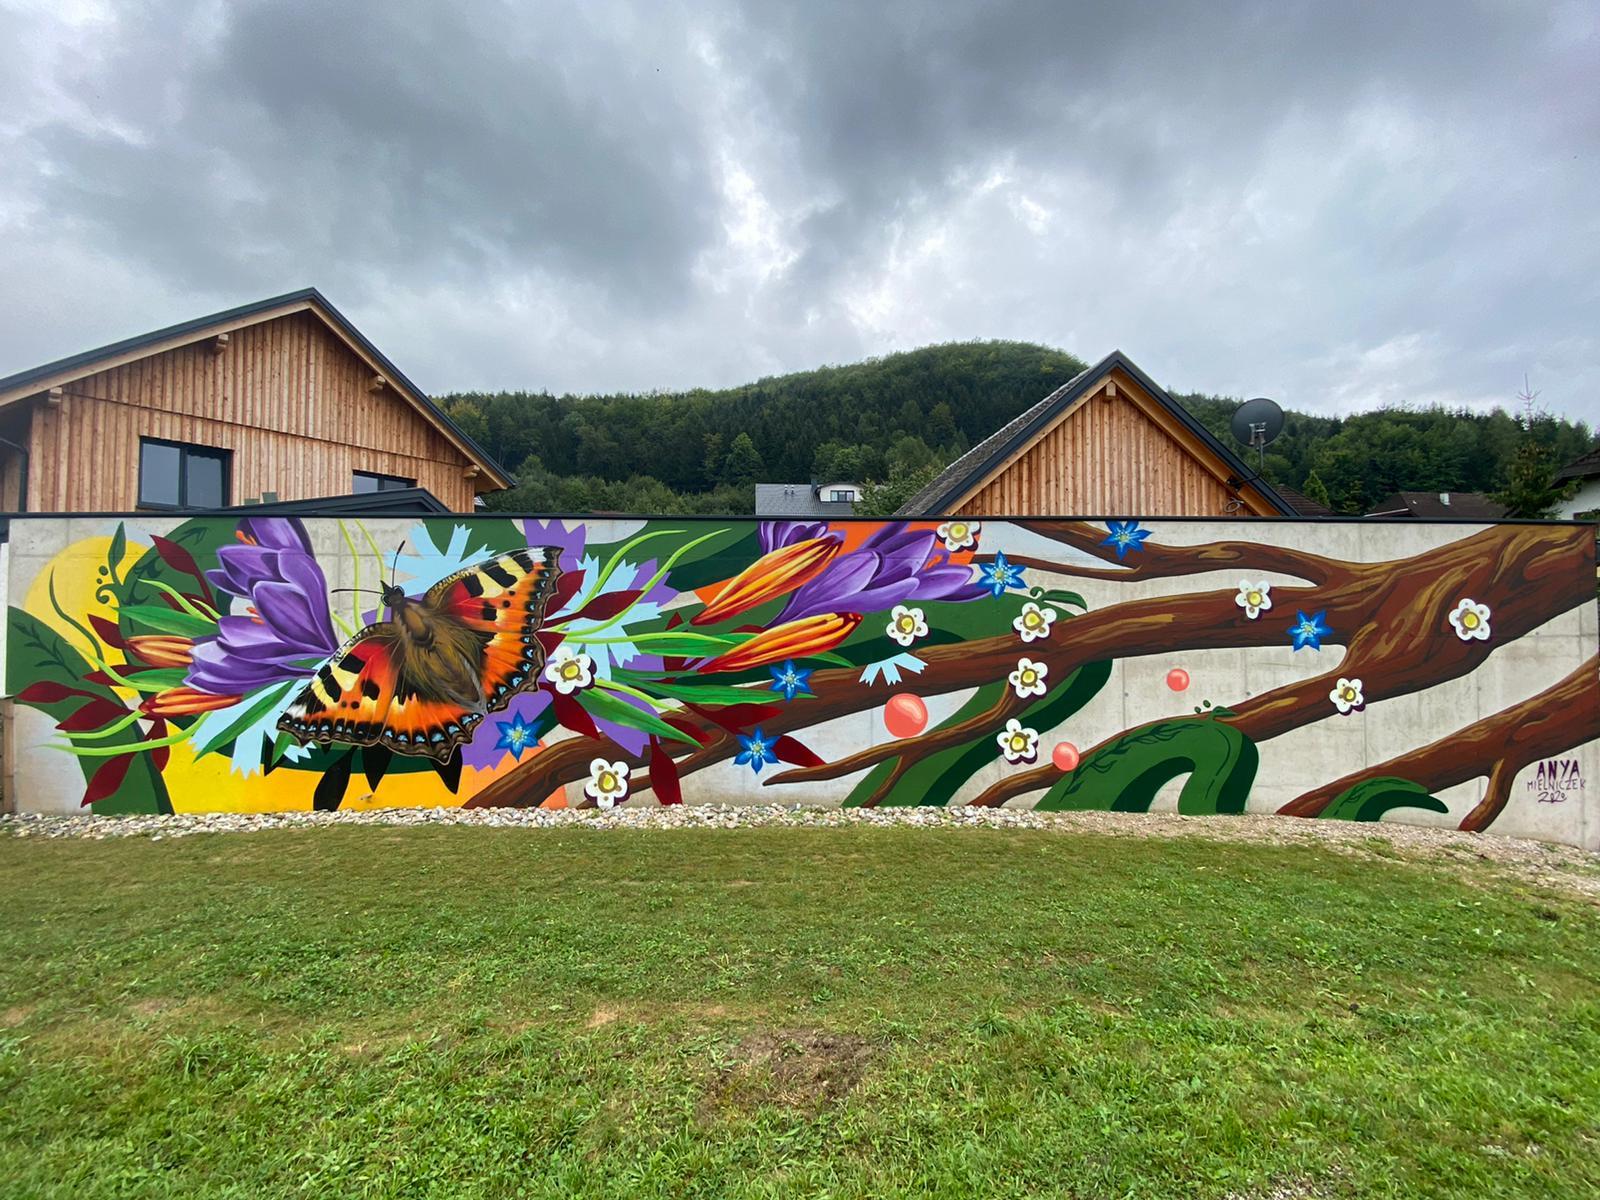 Anya Mielniczek – Mural City 2020